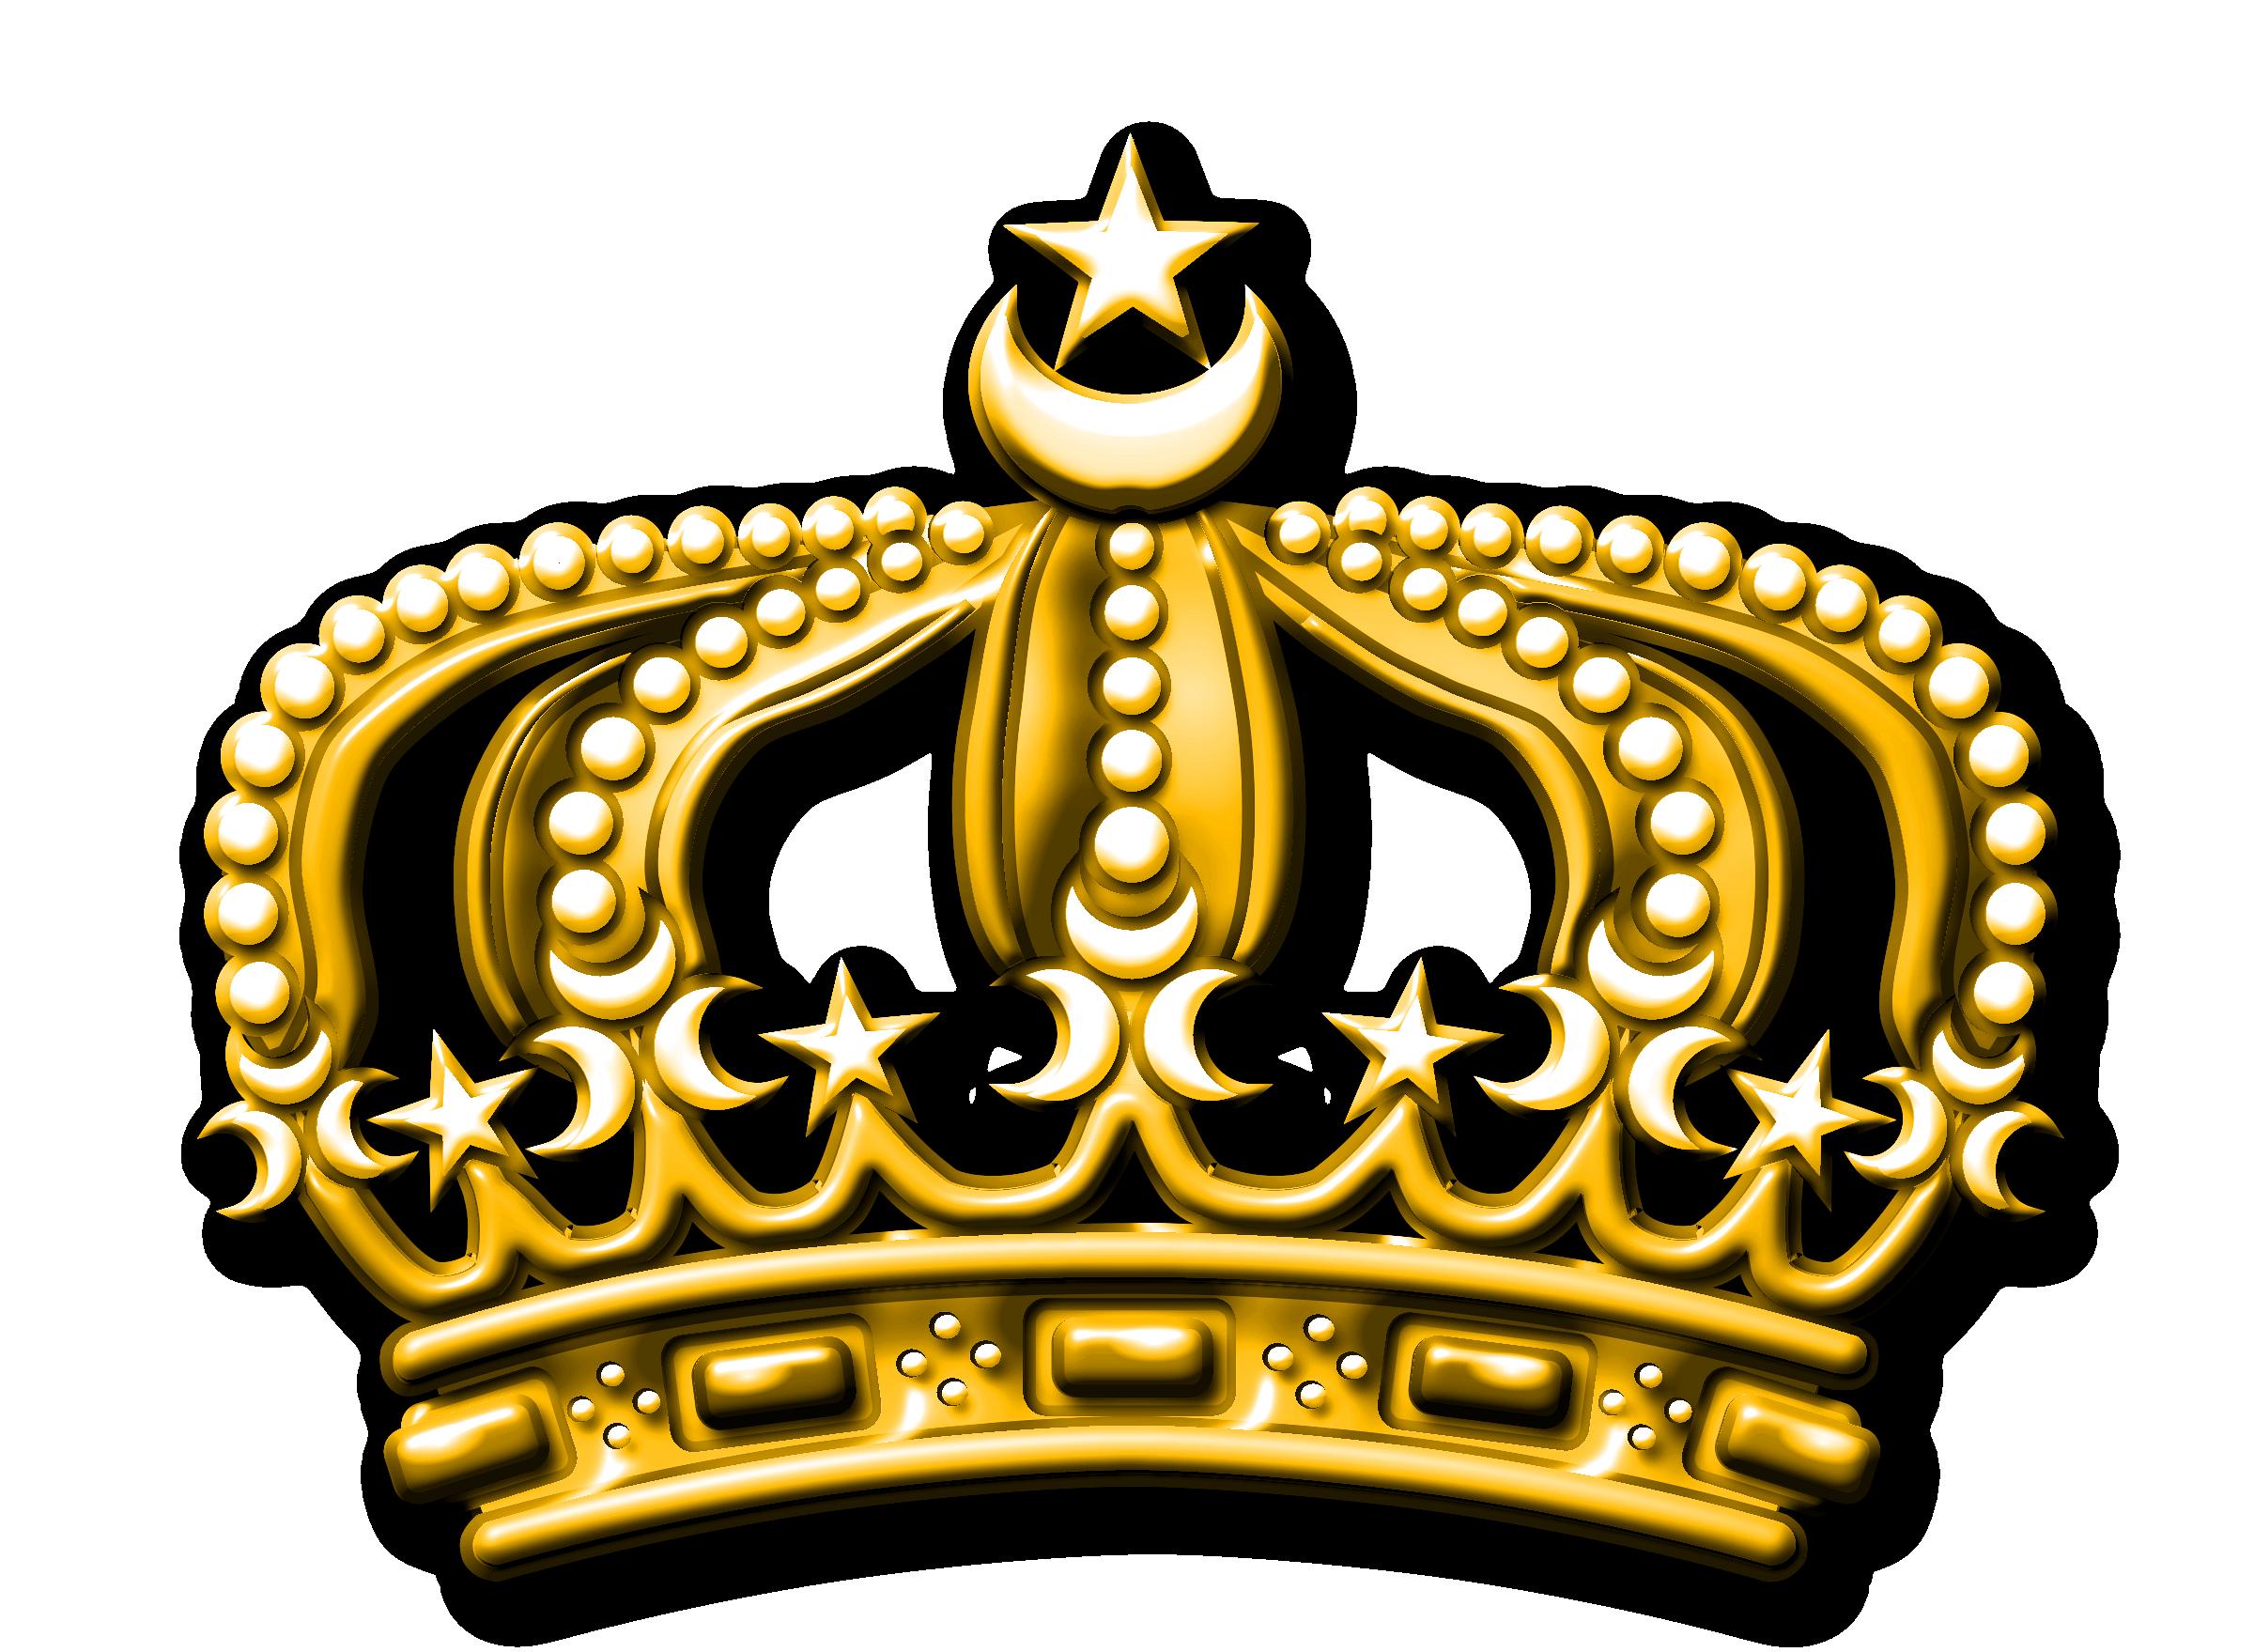 Free Kings Crown Logo, Download Free Clip Art, Free Clip Art.